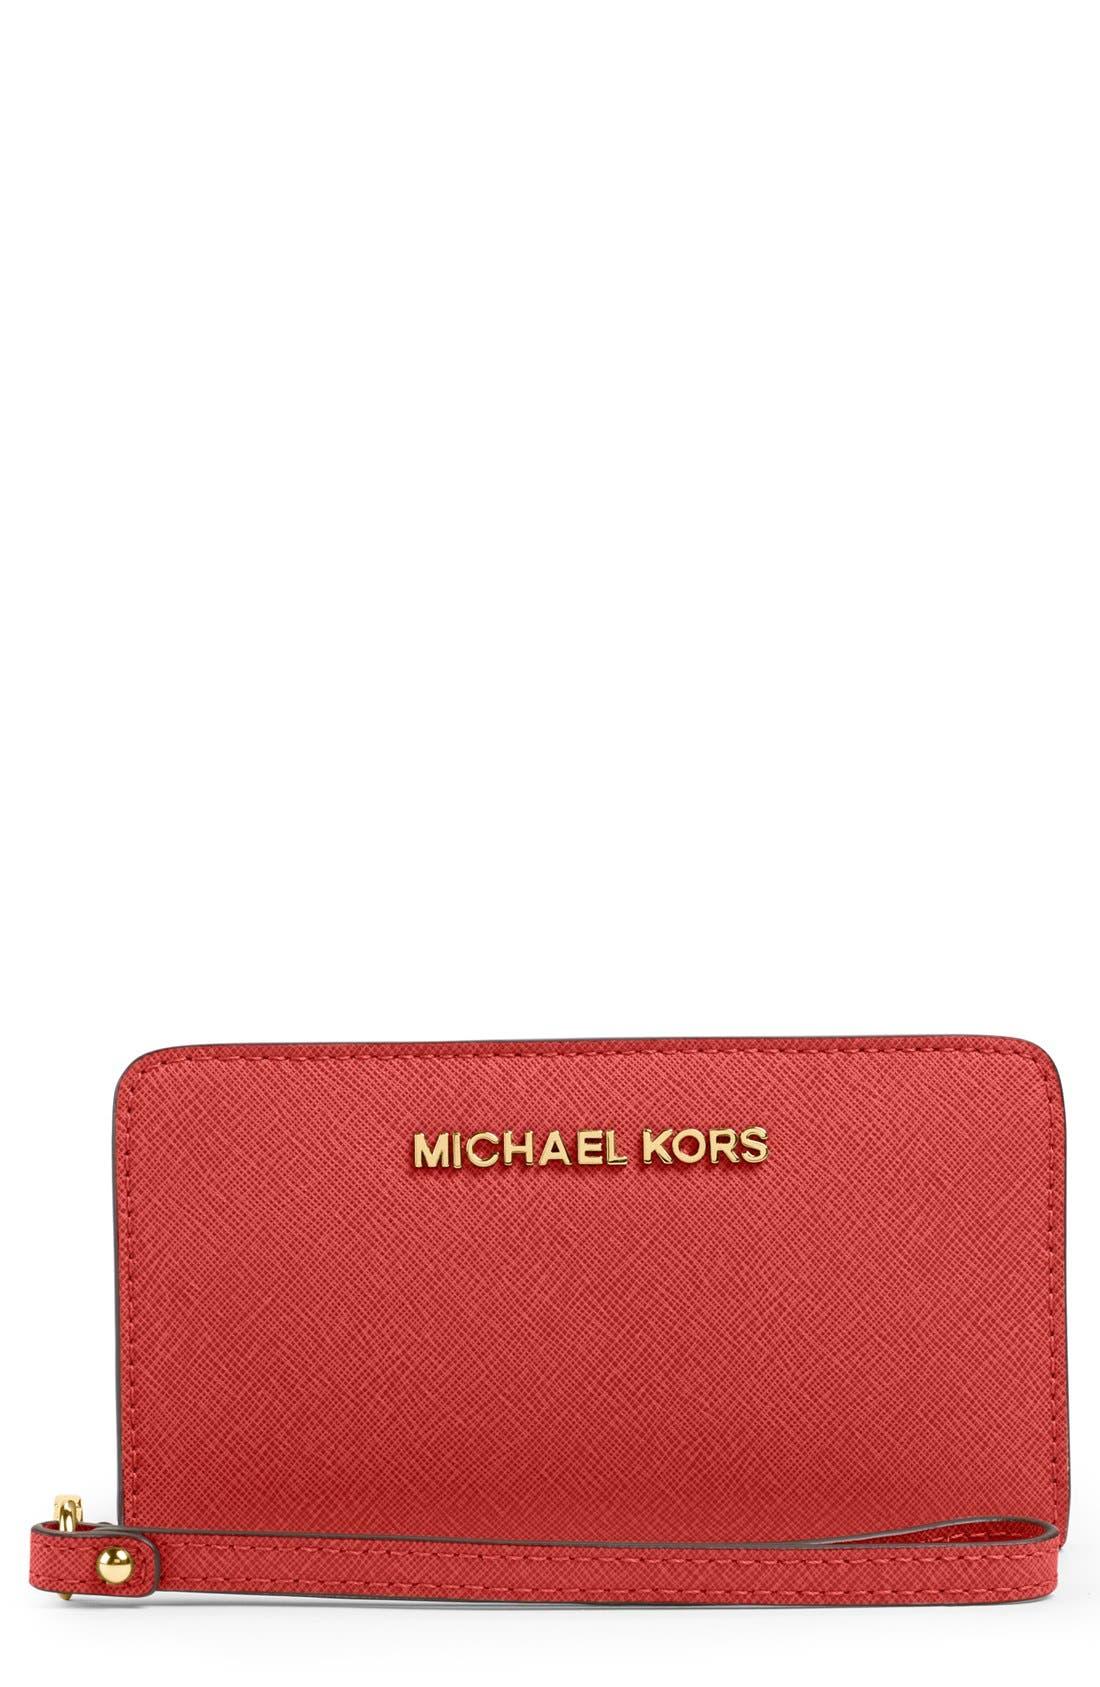 Alternate Image 1 Selected - MICHAEL Michael Kors Saffiano Leather Tech Wristlet